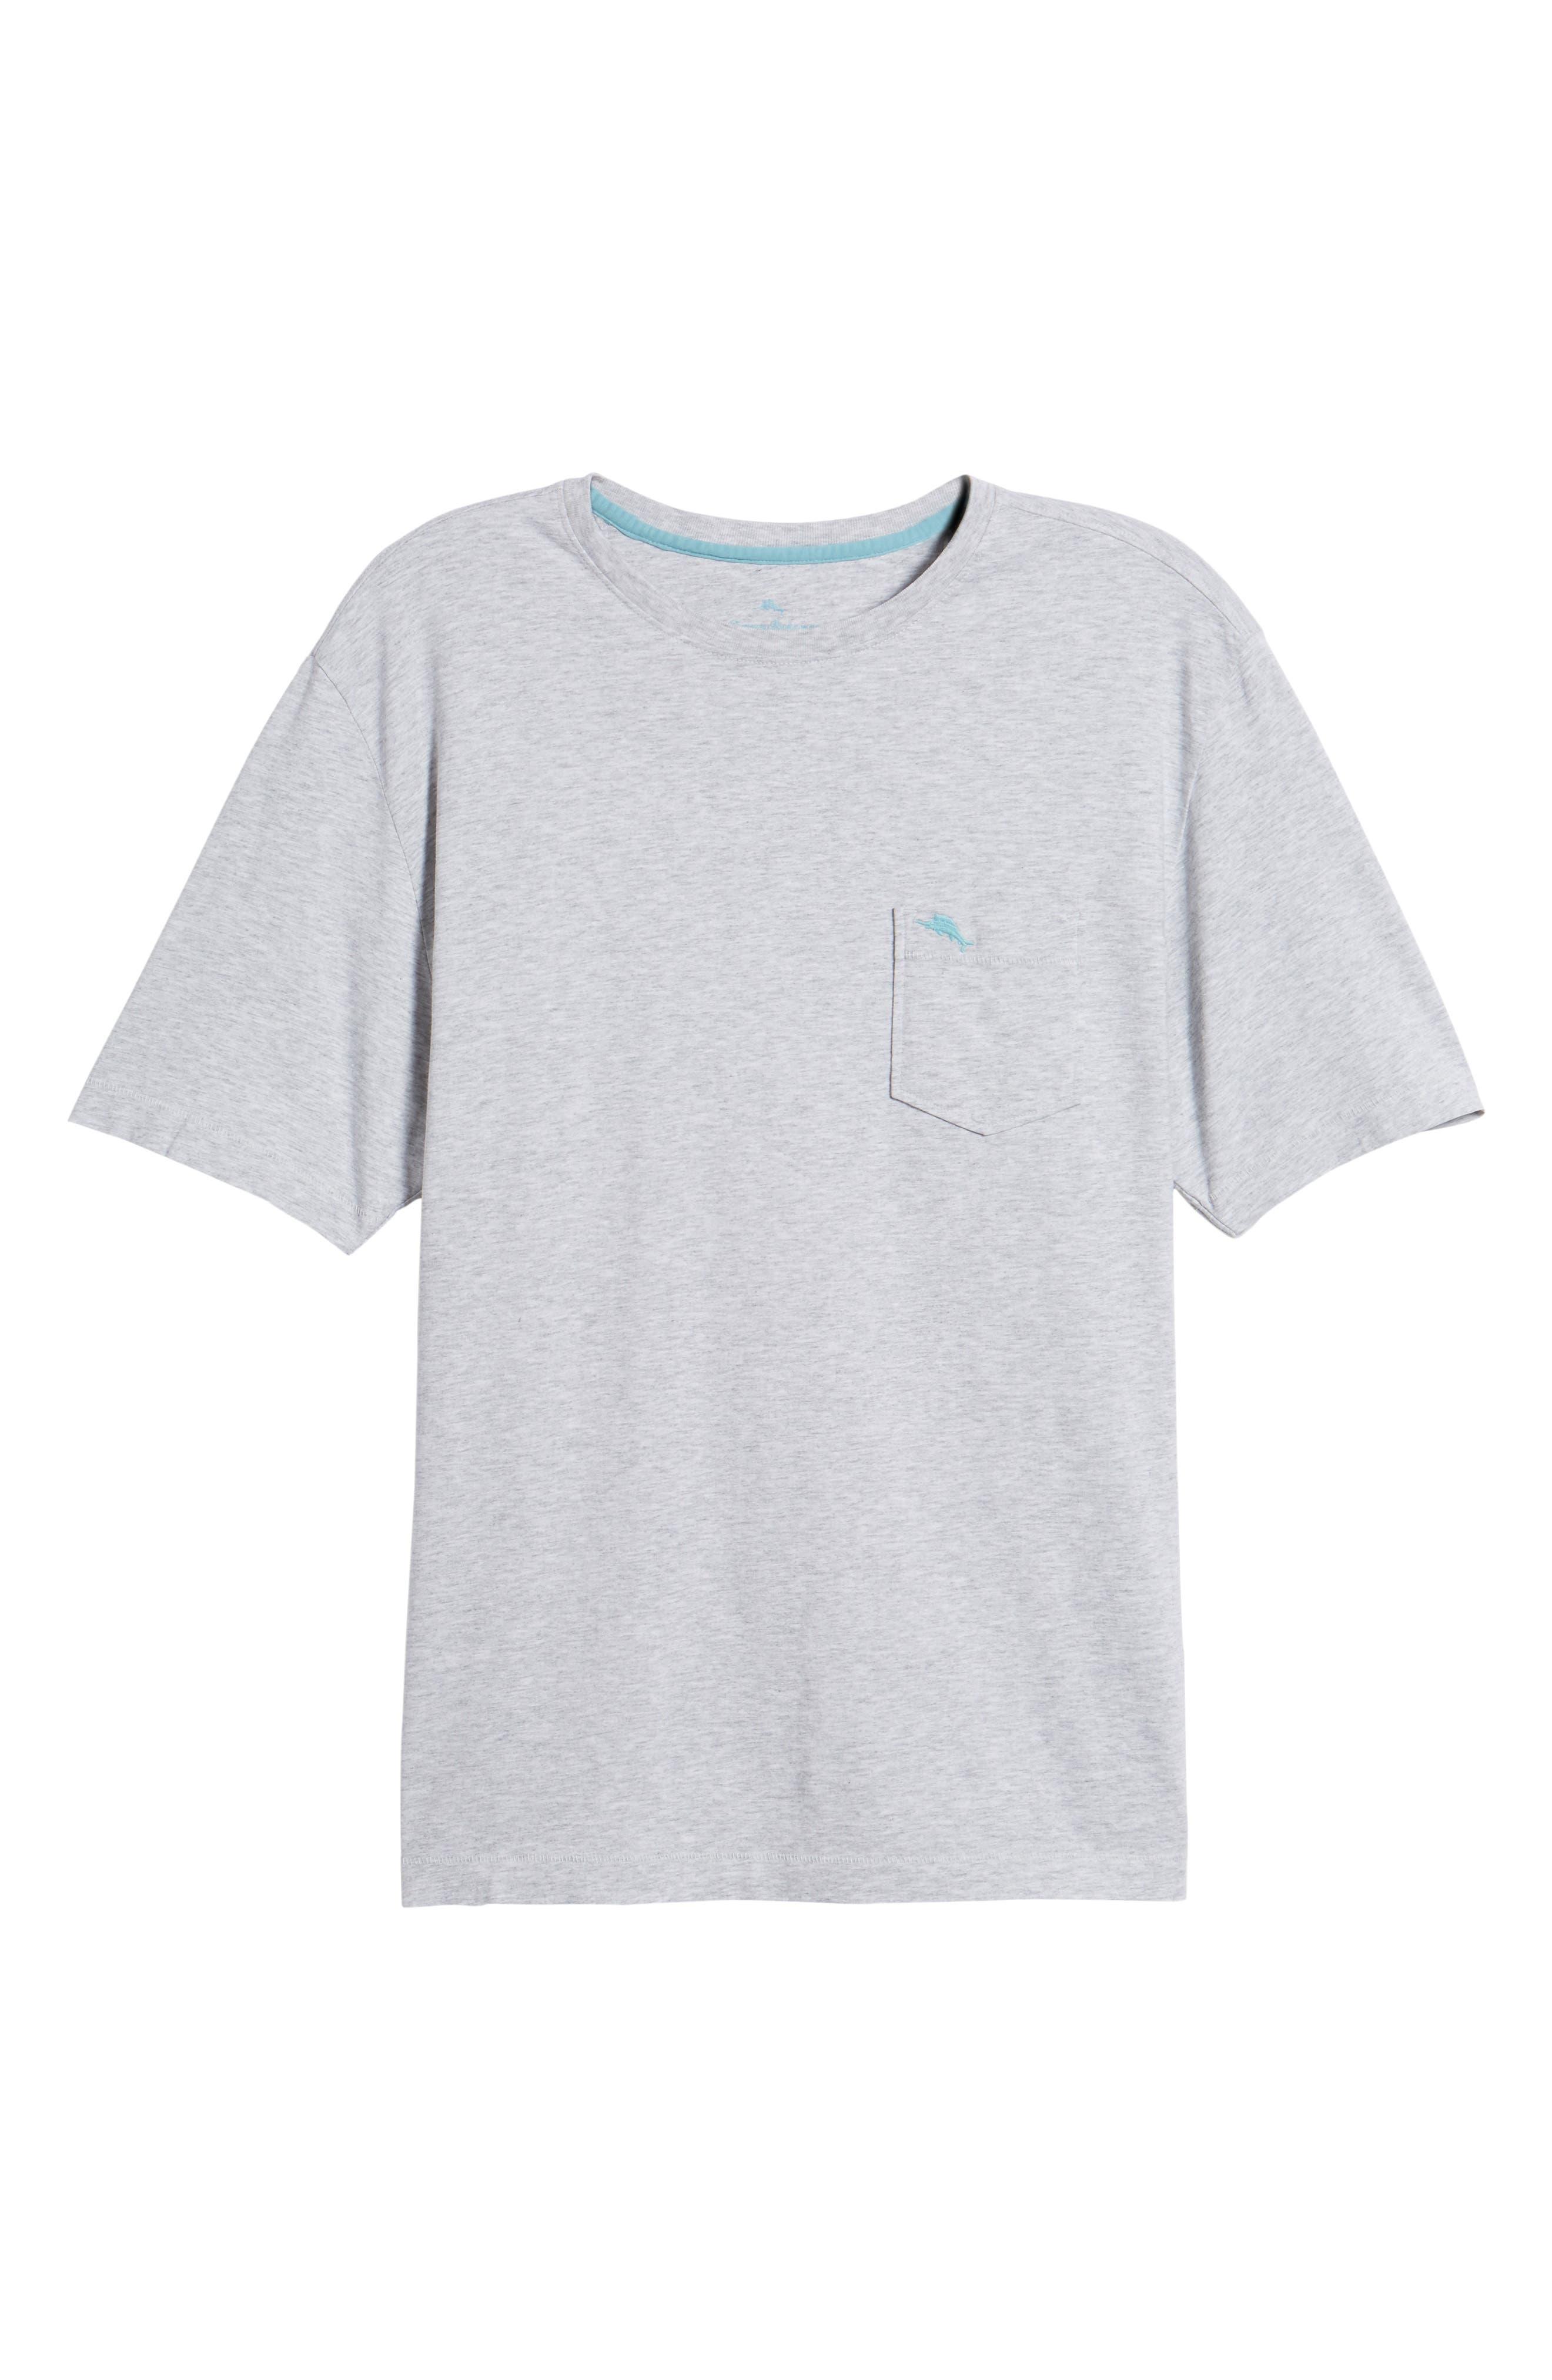 New Bali Skyline T-Shirt,                             Alternate thumbnail 6, color,                             Zinc Gray Heather